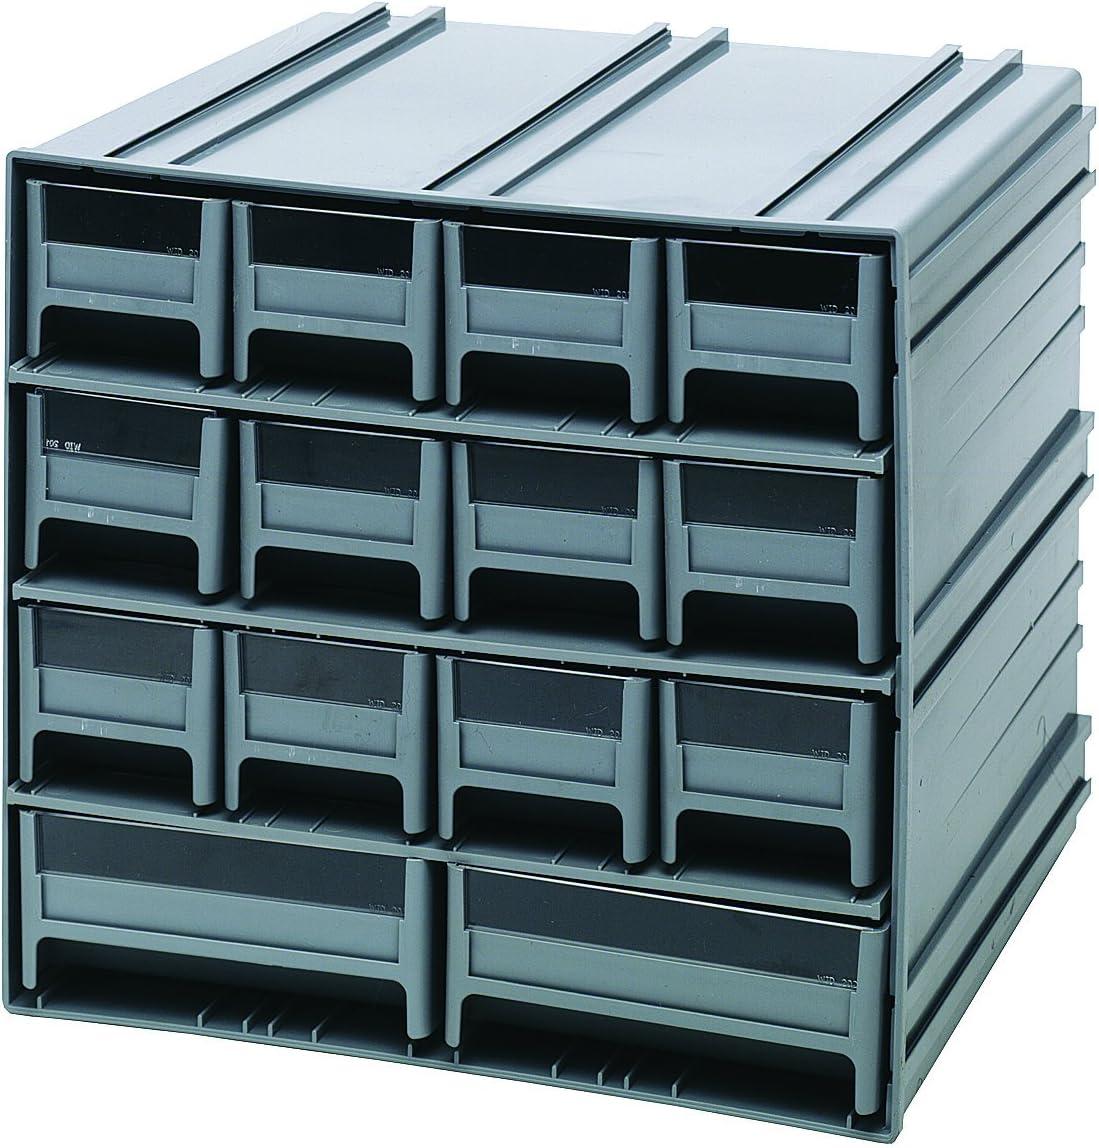 Quantum QIC-12123BL Interlocking Gray Storage Cabinet 2021 model 4 years warranty with 14 Bl